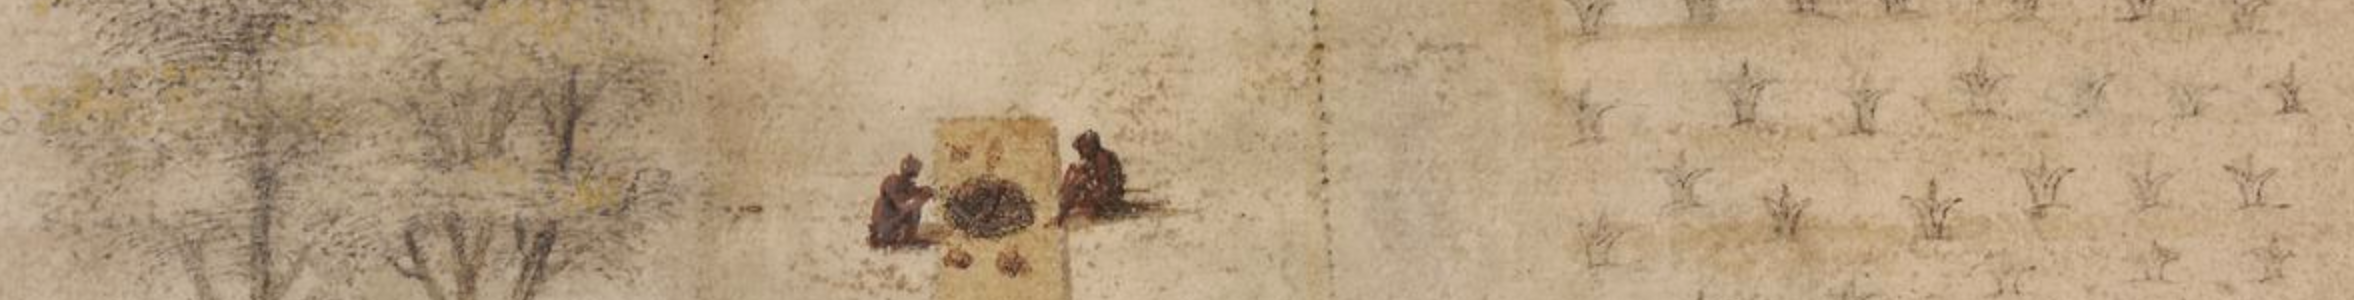 detail from Secoton, John White